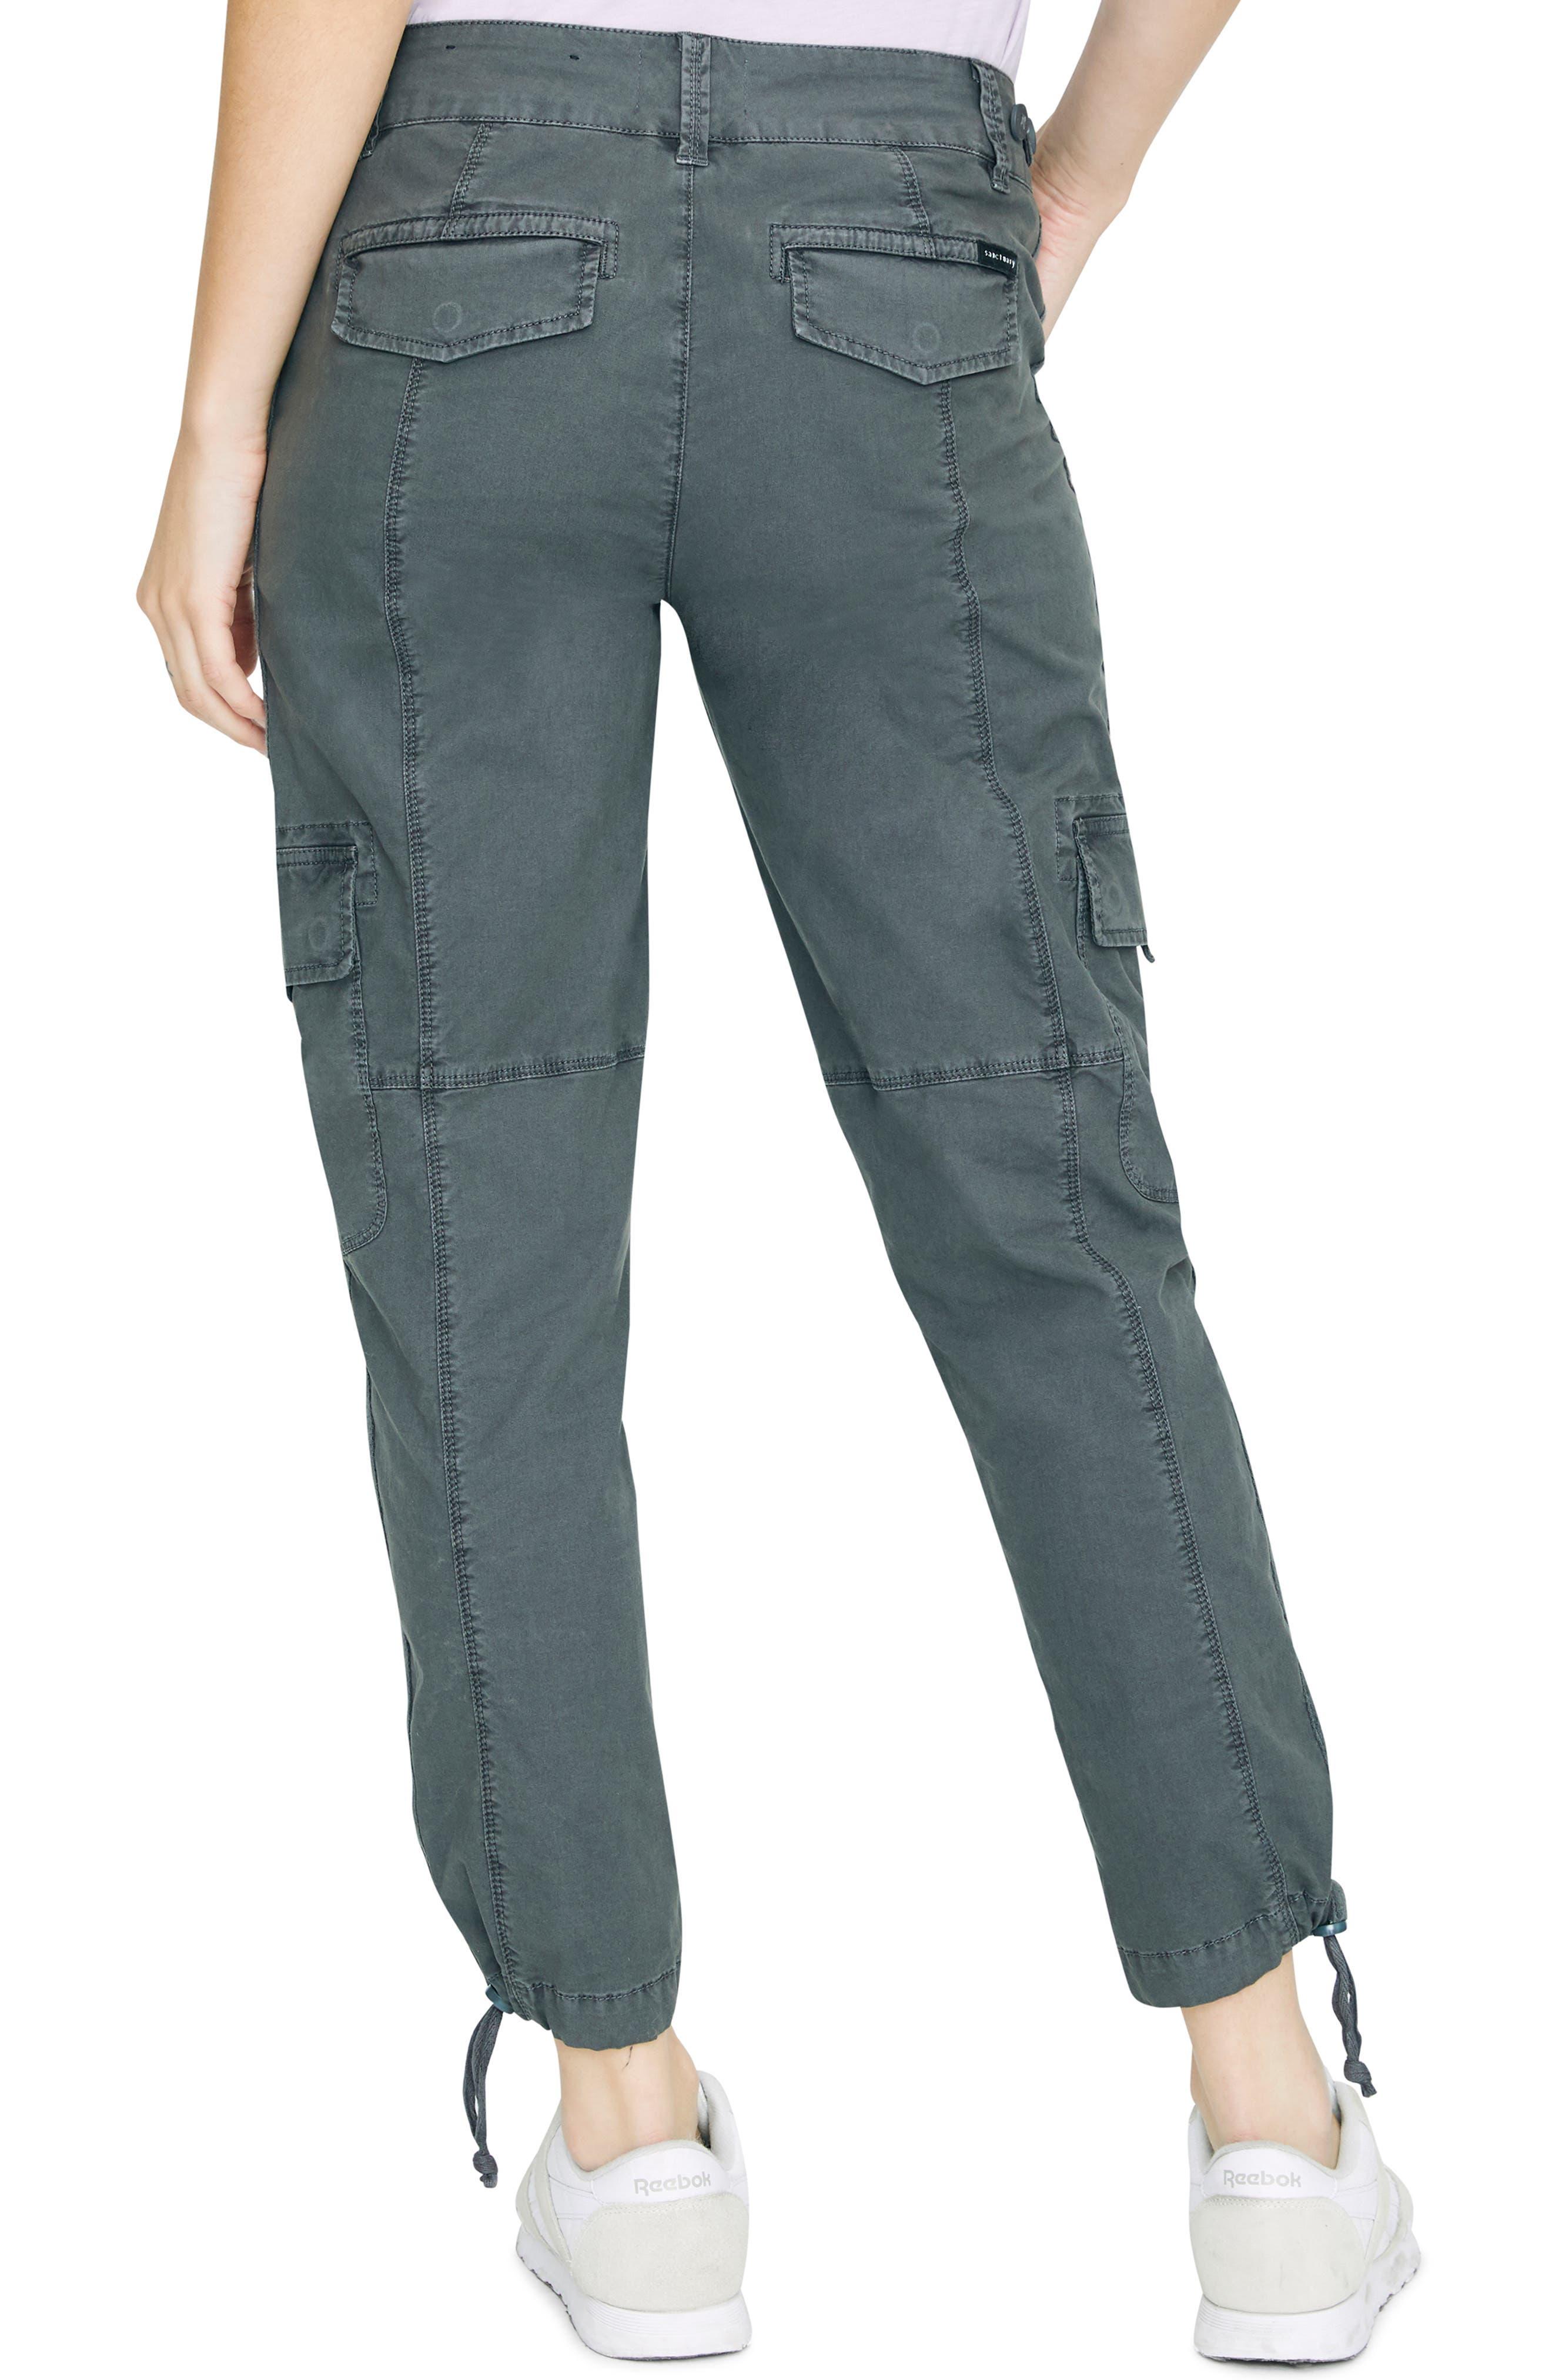 SANCTUARY, Terrain Crop Cargo Pants, Alternate thumbnail 2, color, WASHED FADED BLACK